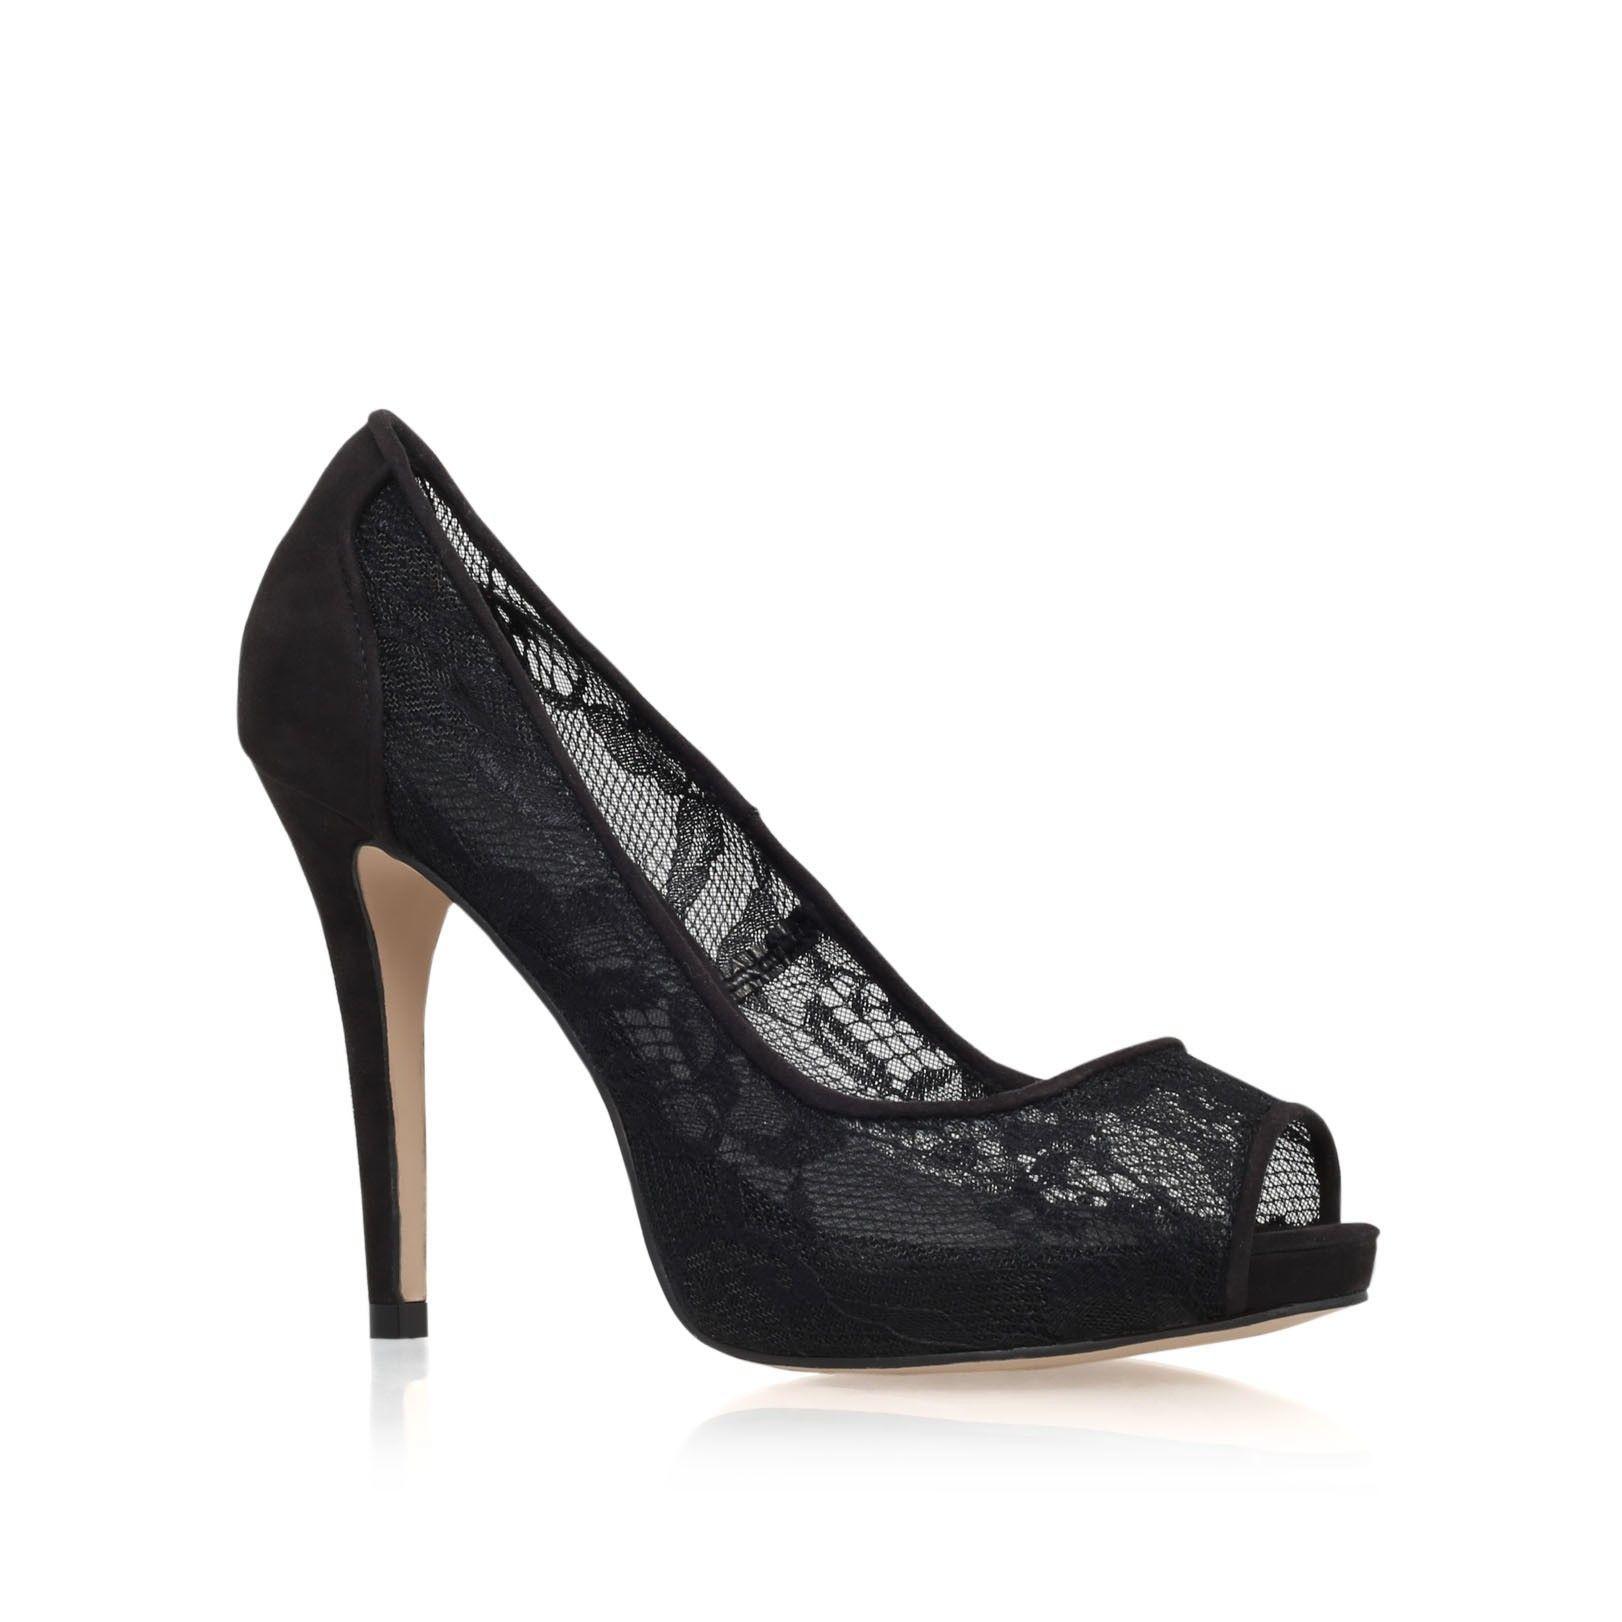 2f8eff4864 lara lace black high heel peep toe shoes from Carvela Kurt Geiger ...